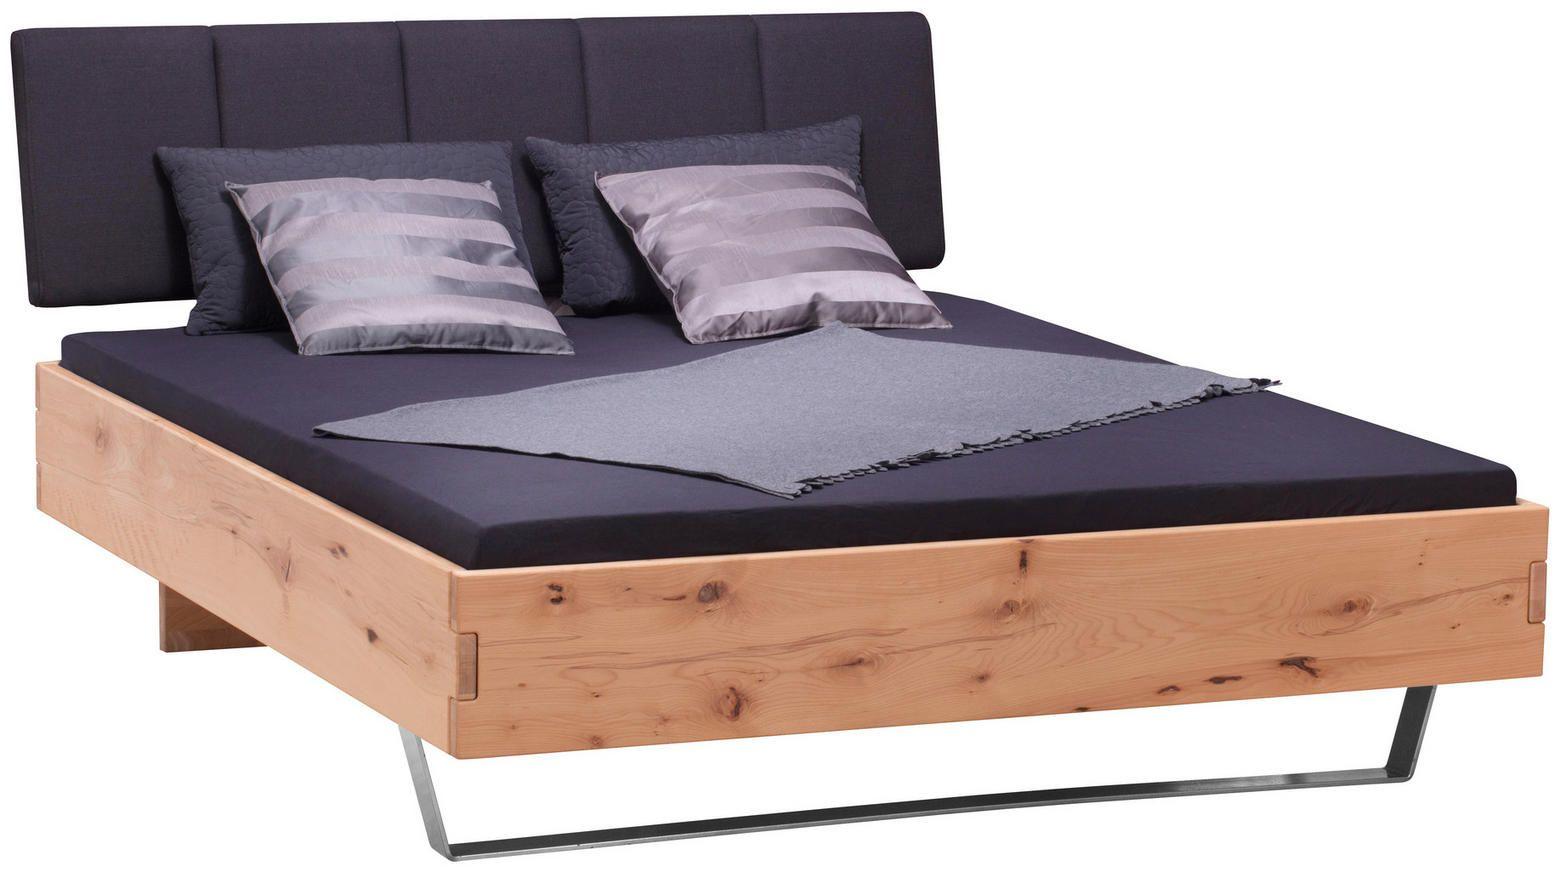 Valnatura Bett 180 X 200 Cm Mit Kopfteil Kaufen Bett Eiche Bett Bett Holz